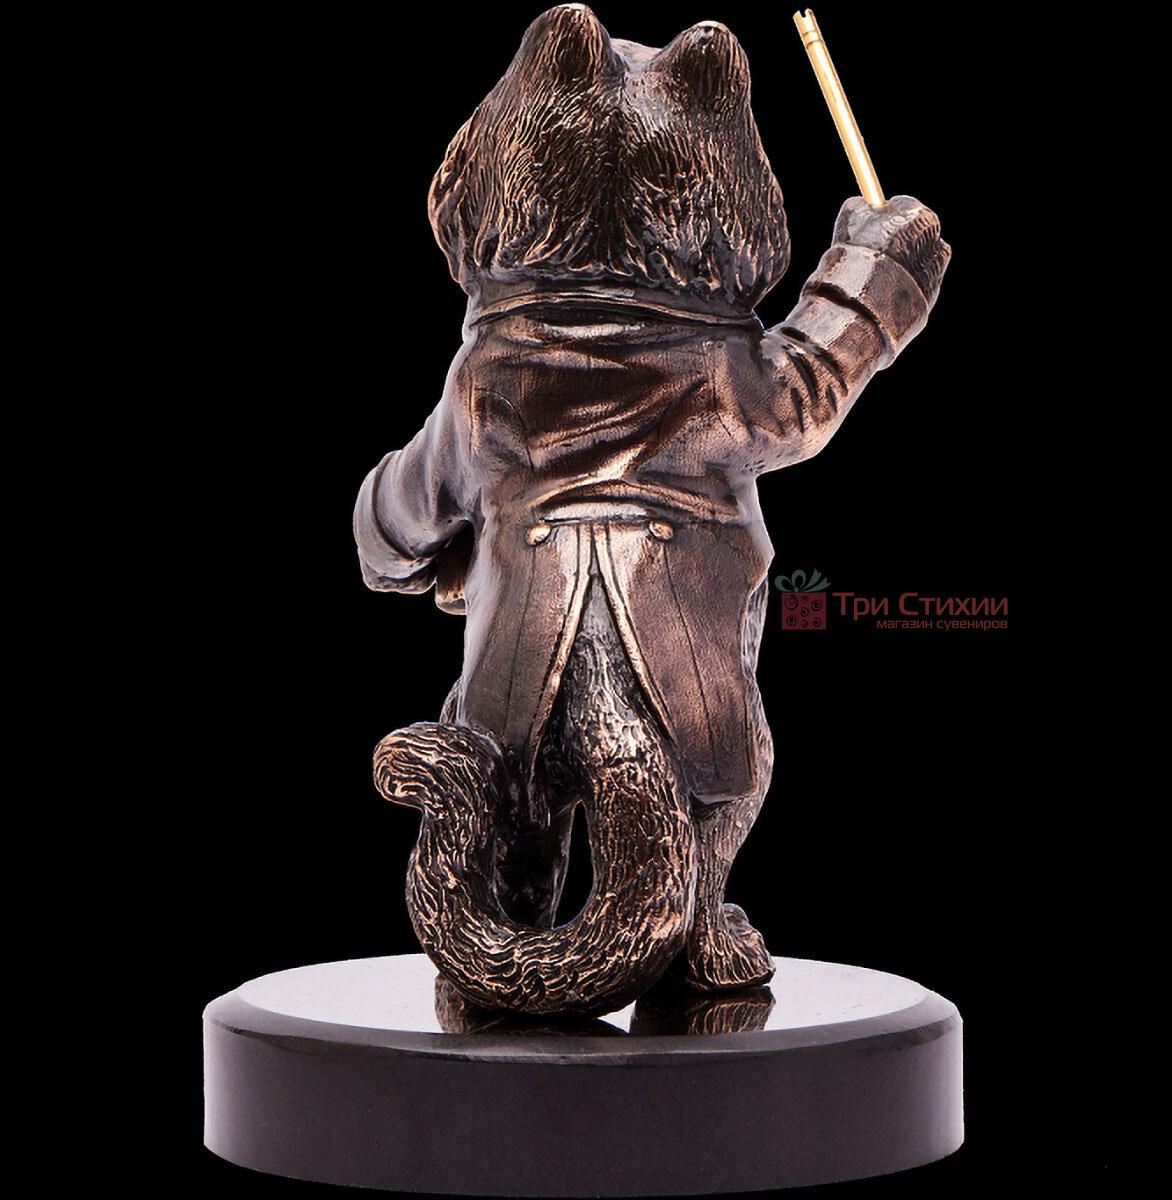 Статуэтка из бронзы «Лови удачу» Vizuri (Визури) C01, фото 4